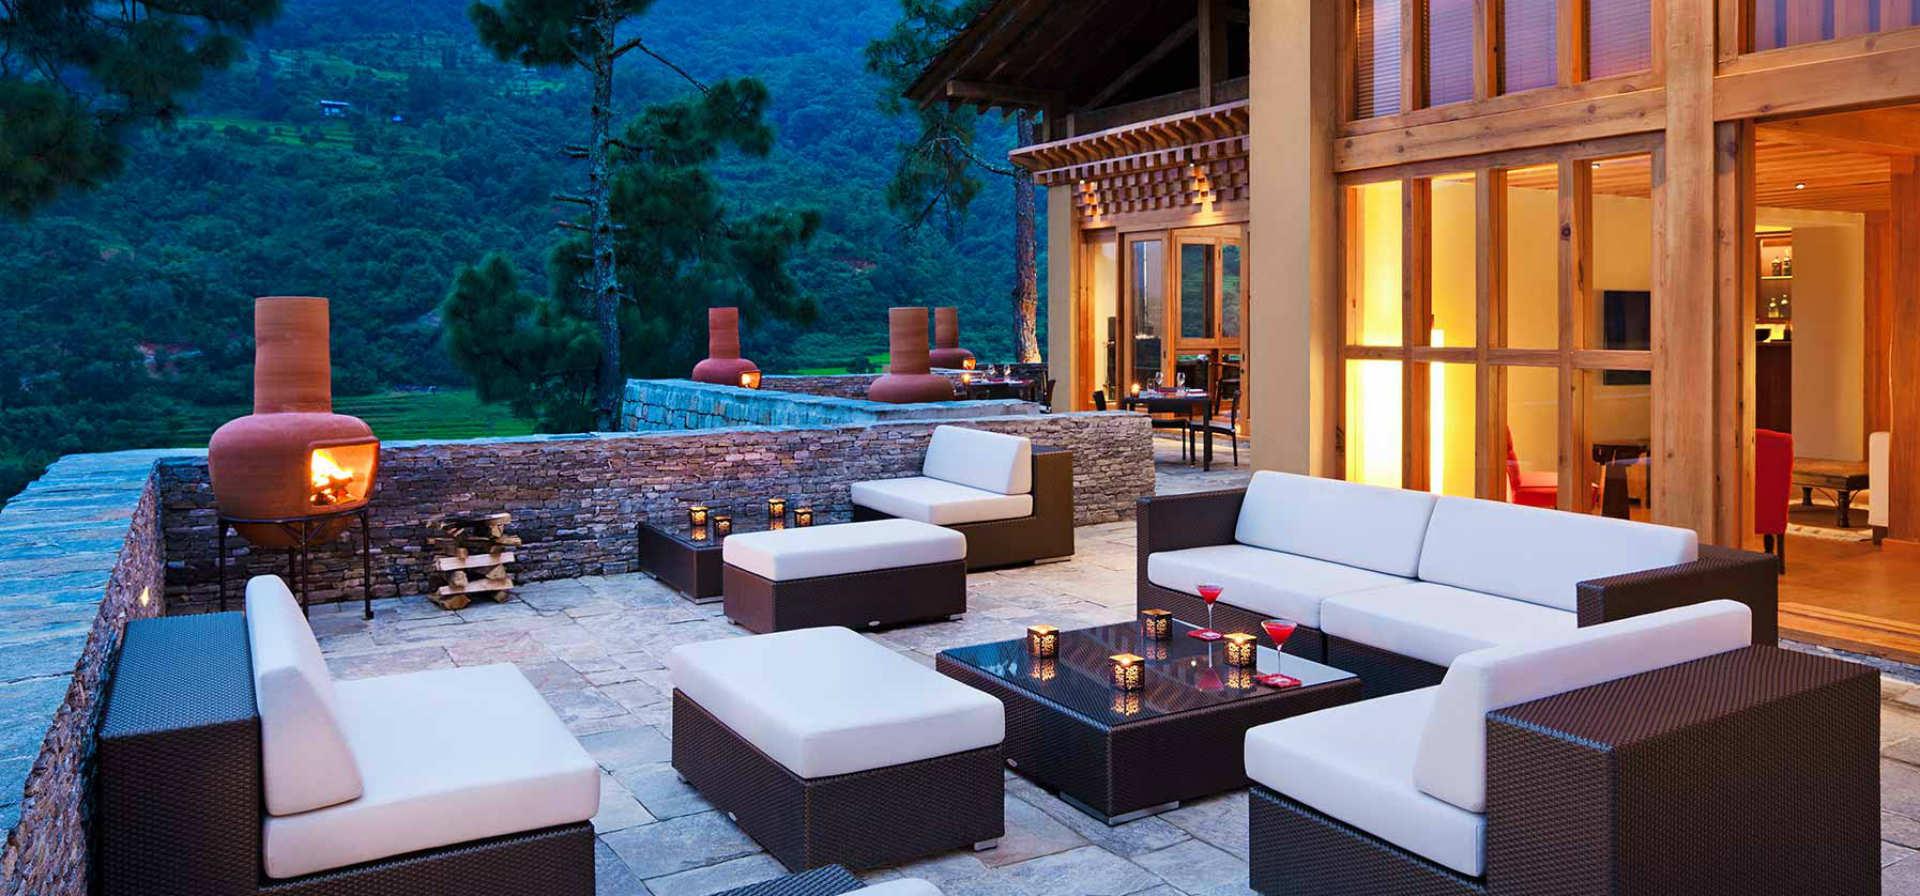 COMO Uma Bhutan Luxury Experience